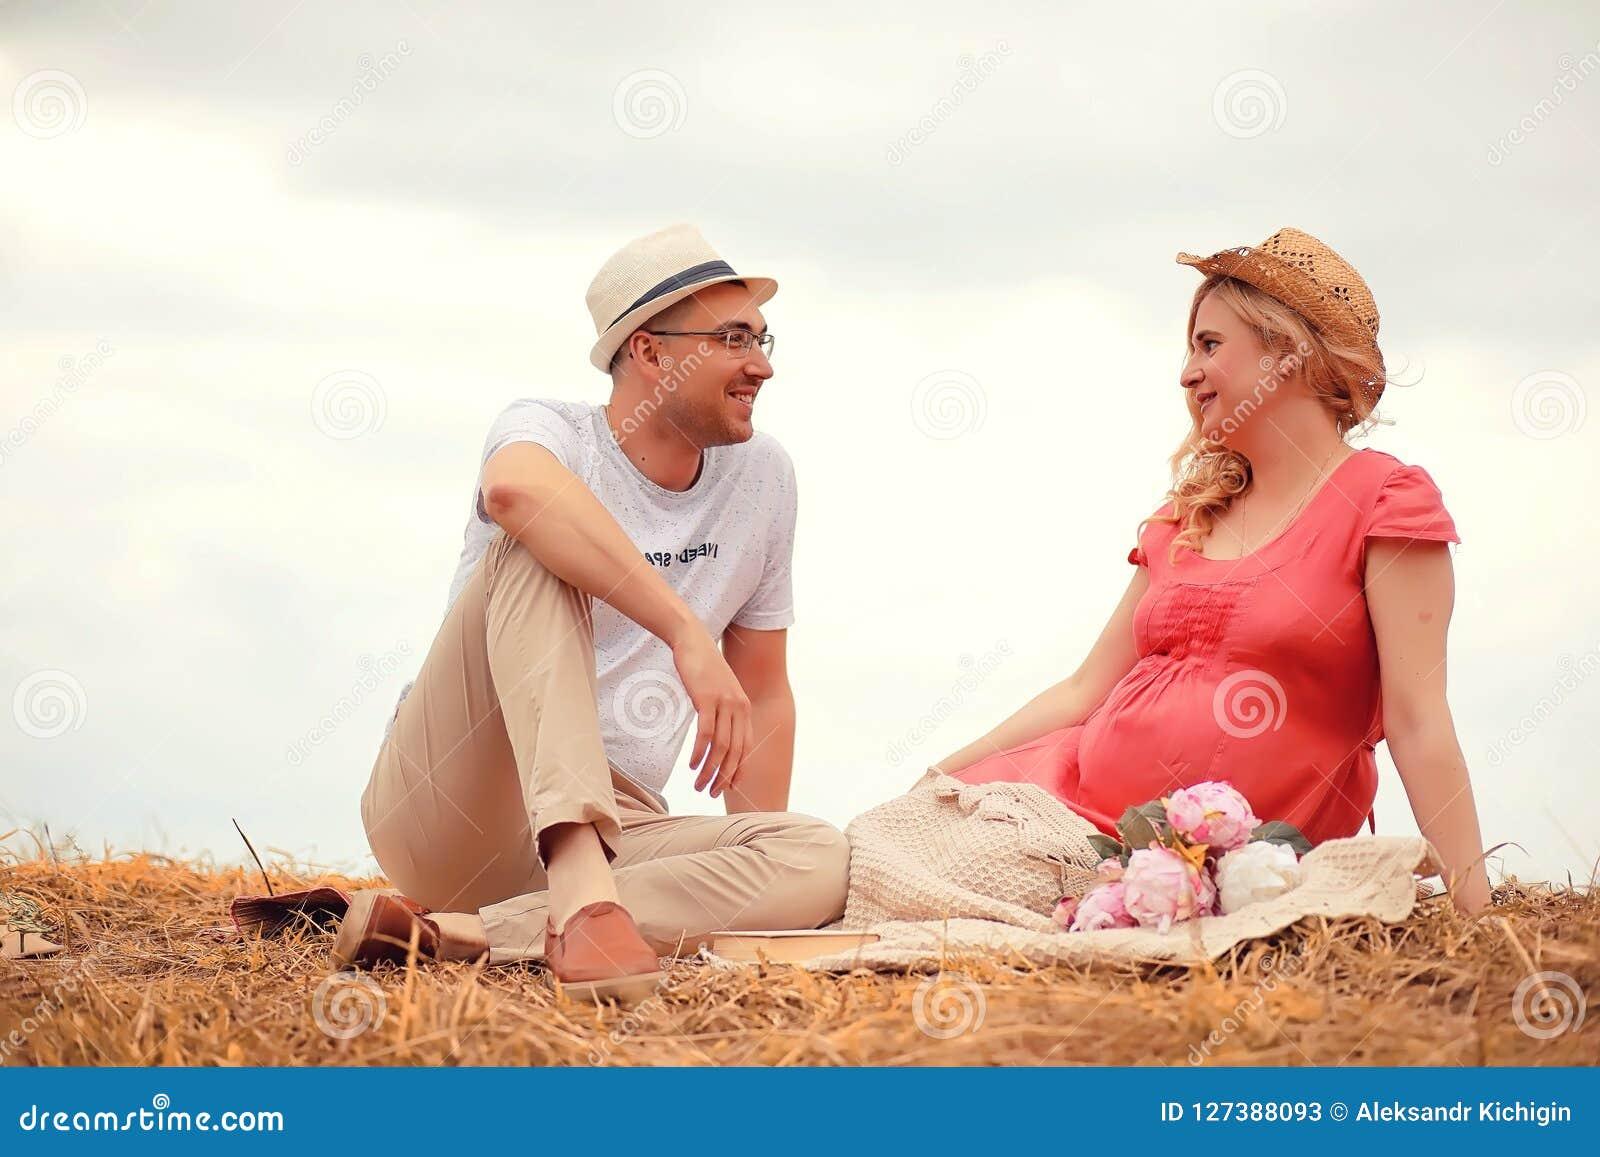 pregnant girl dating